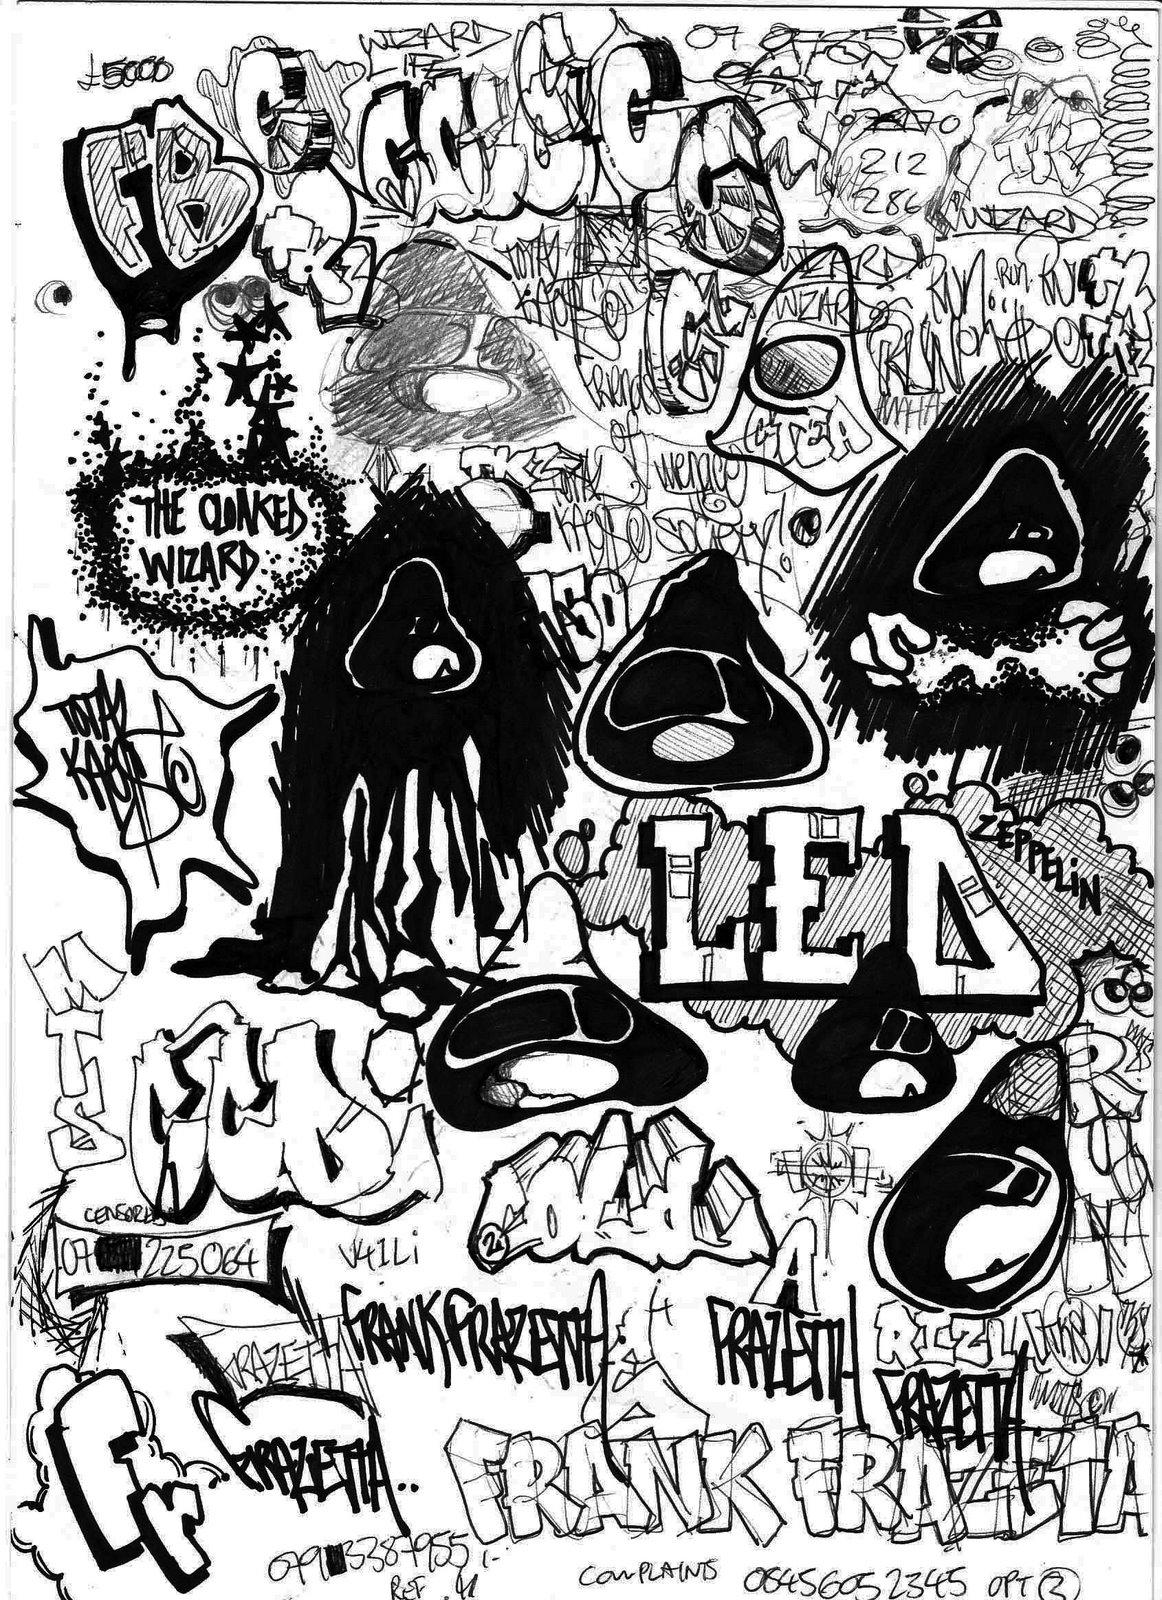 Graffiti / Straßenkunst - Malbuch Fur Erwachsene | JustColor